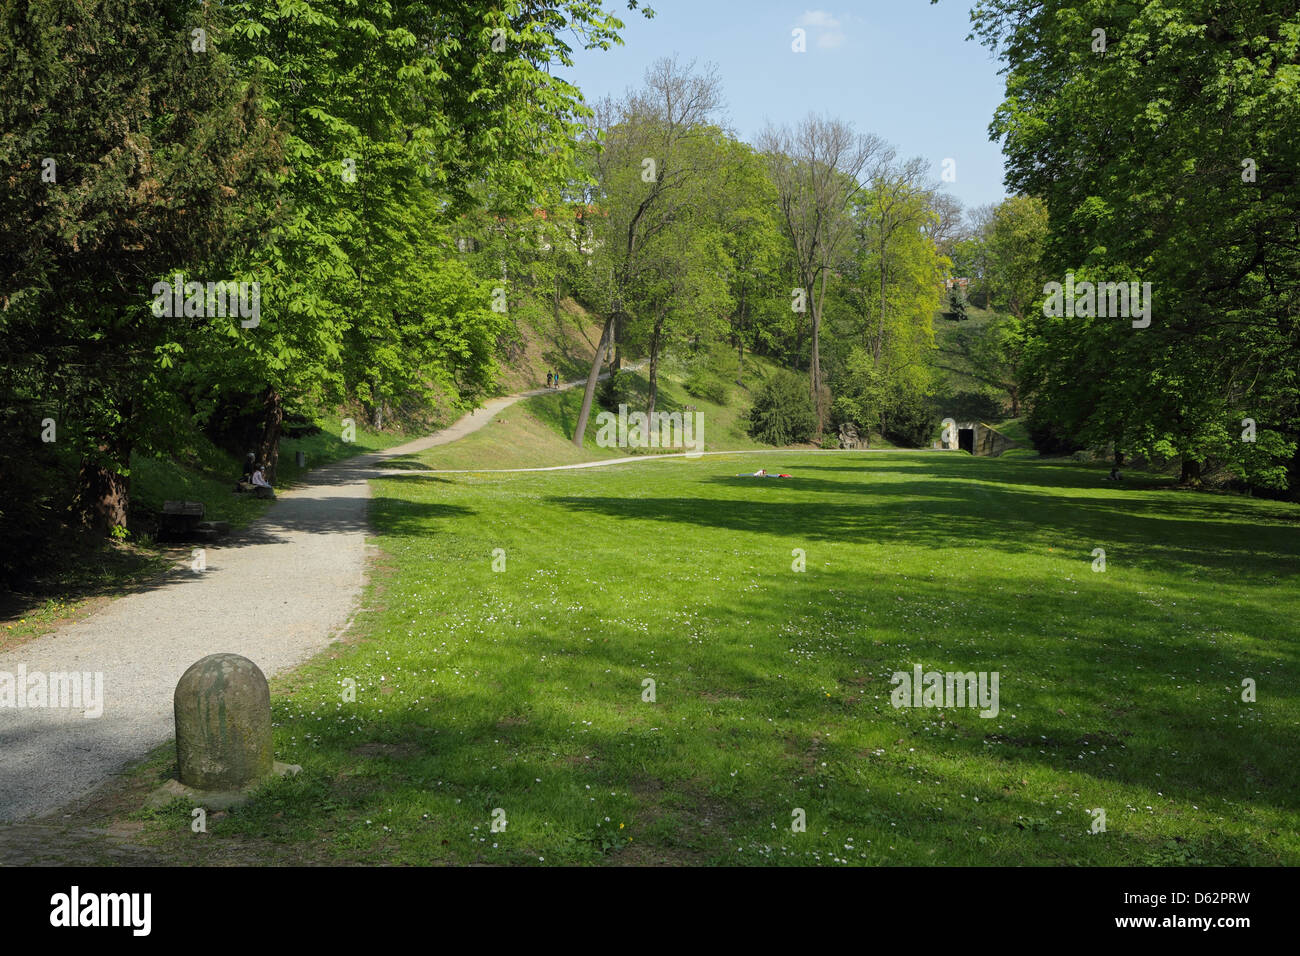 Letná Park is a large park on Letná hill, Prague - Stock Image